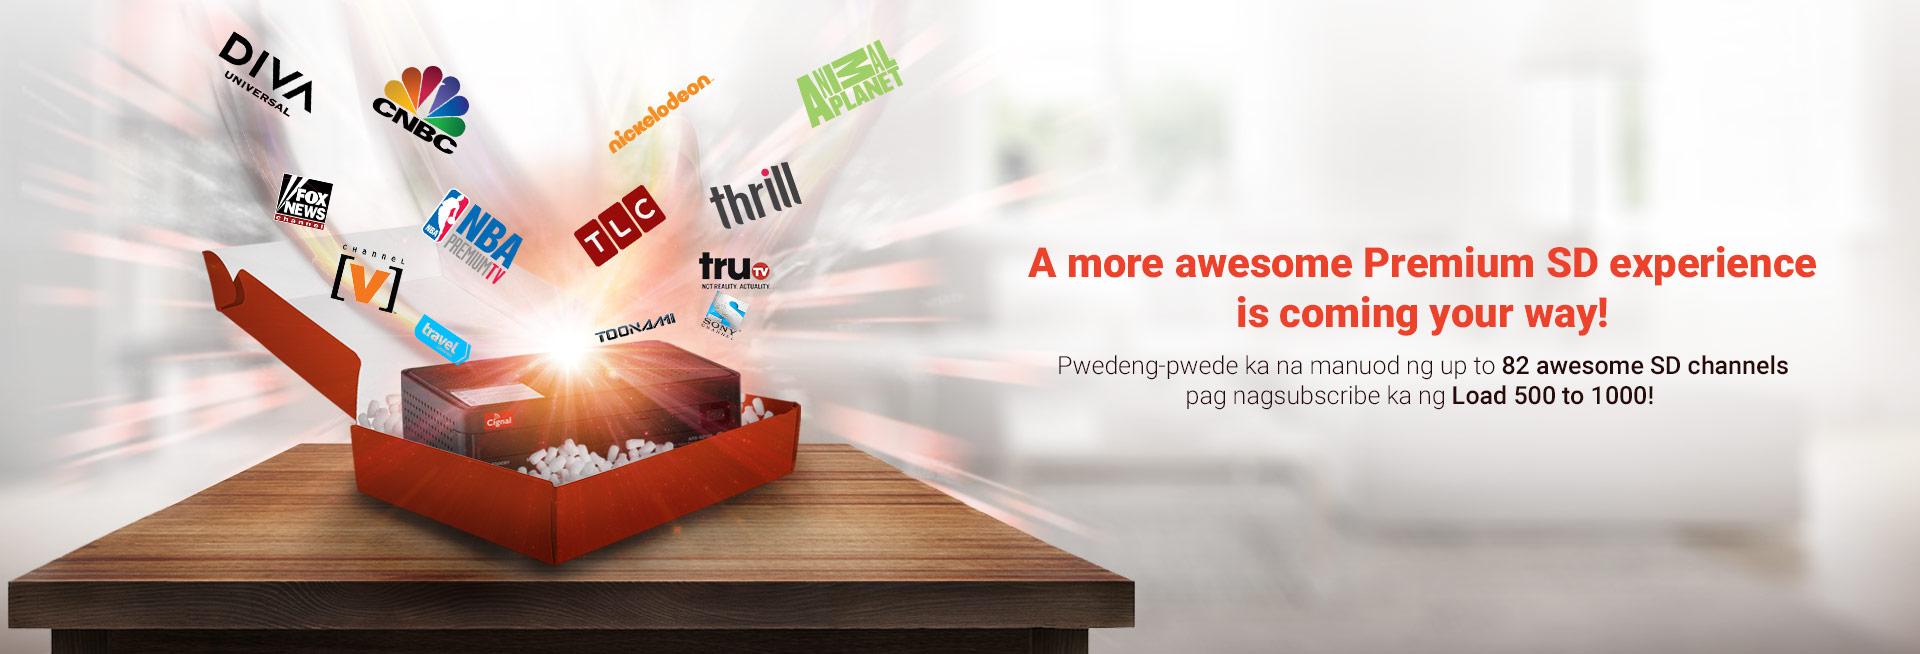 Prepaid Premium SD Kit